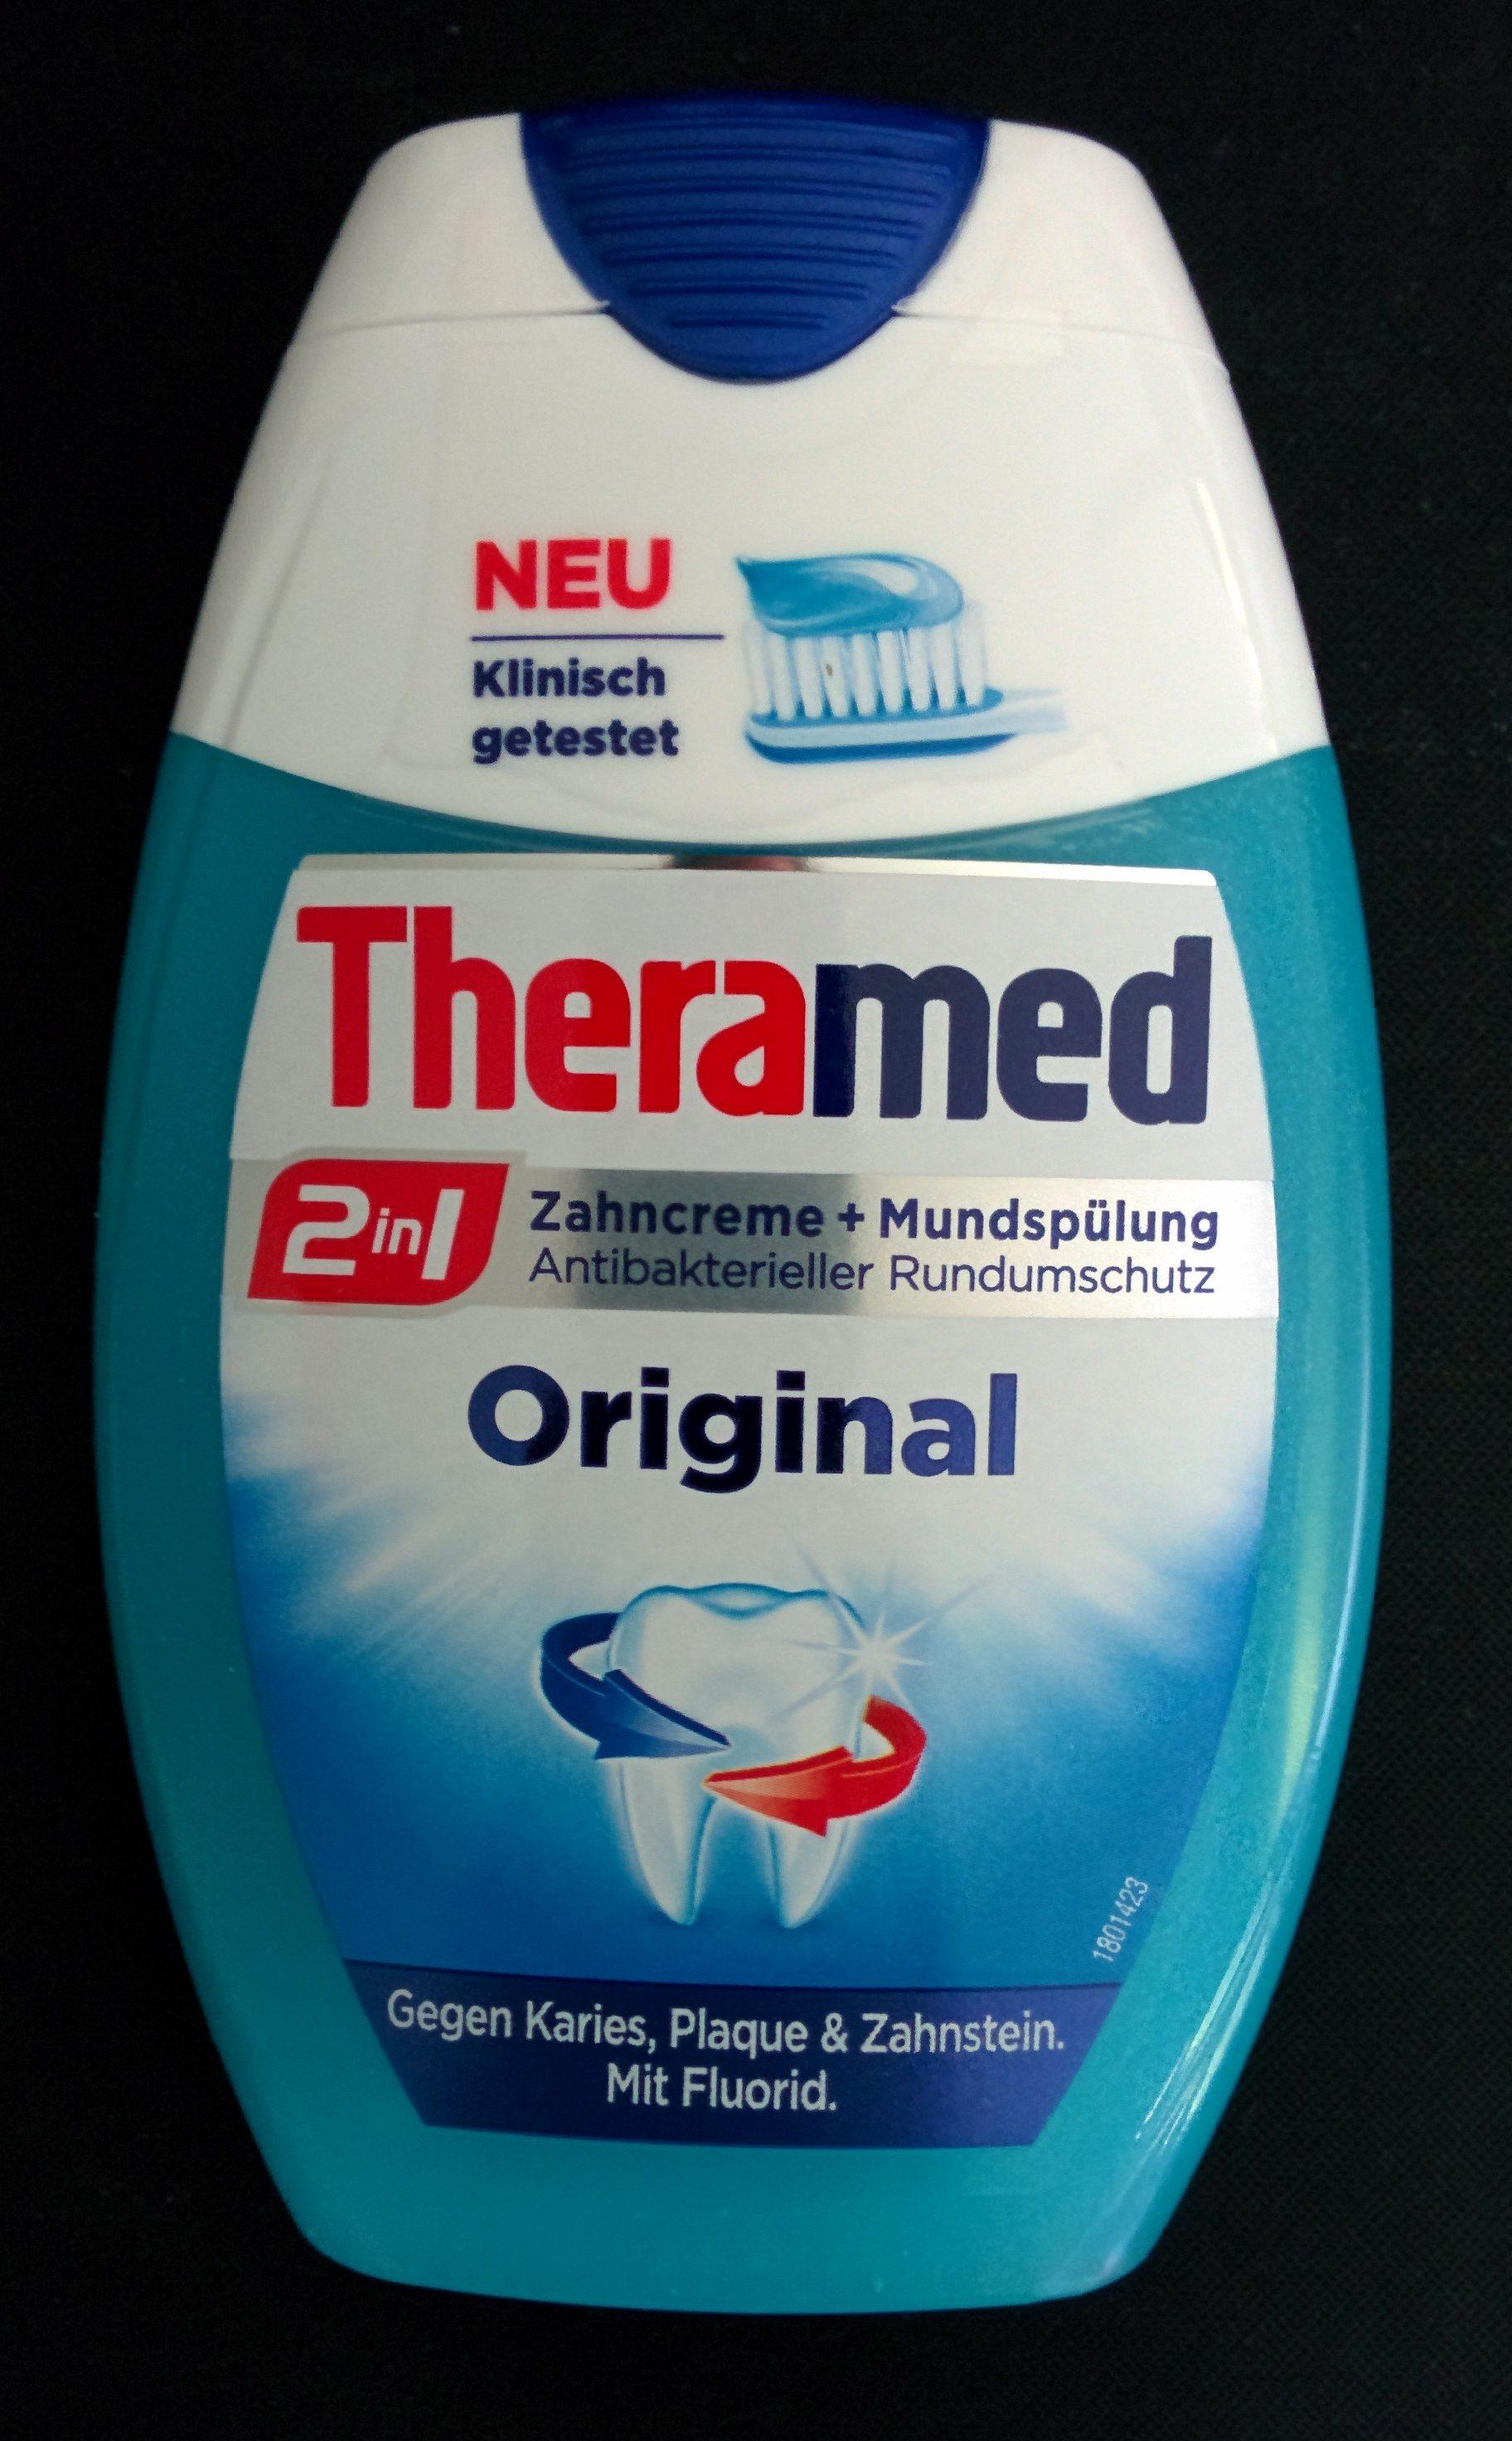 2 in 1 - Zahncreme + Mundspülung - Original - Product - de